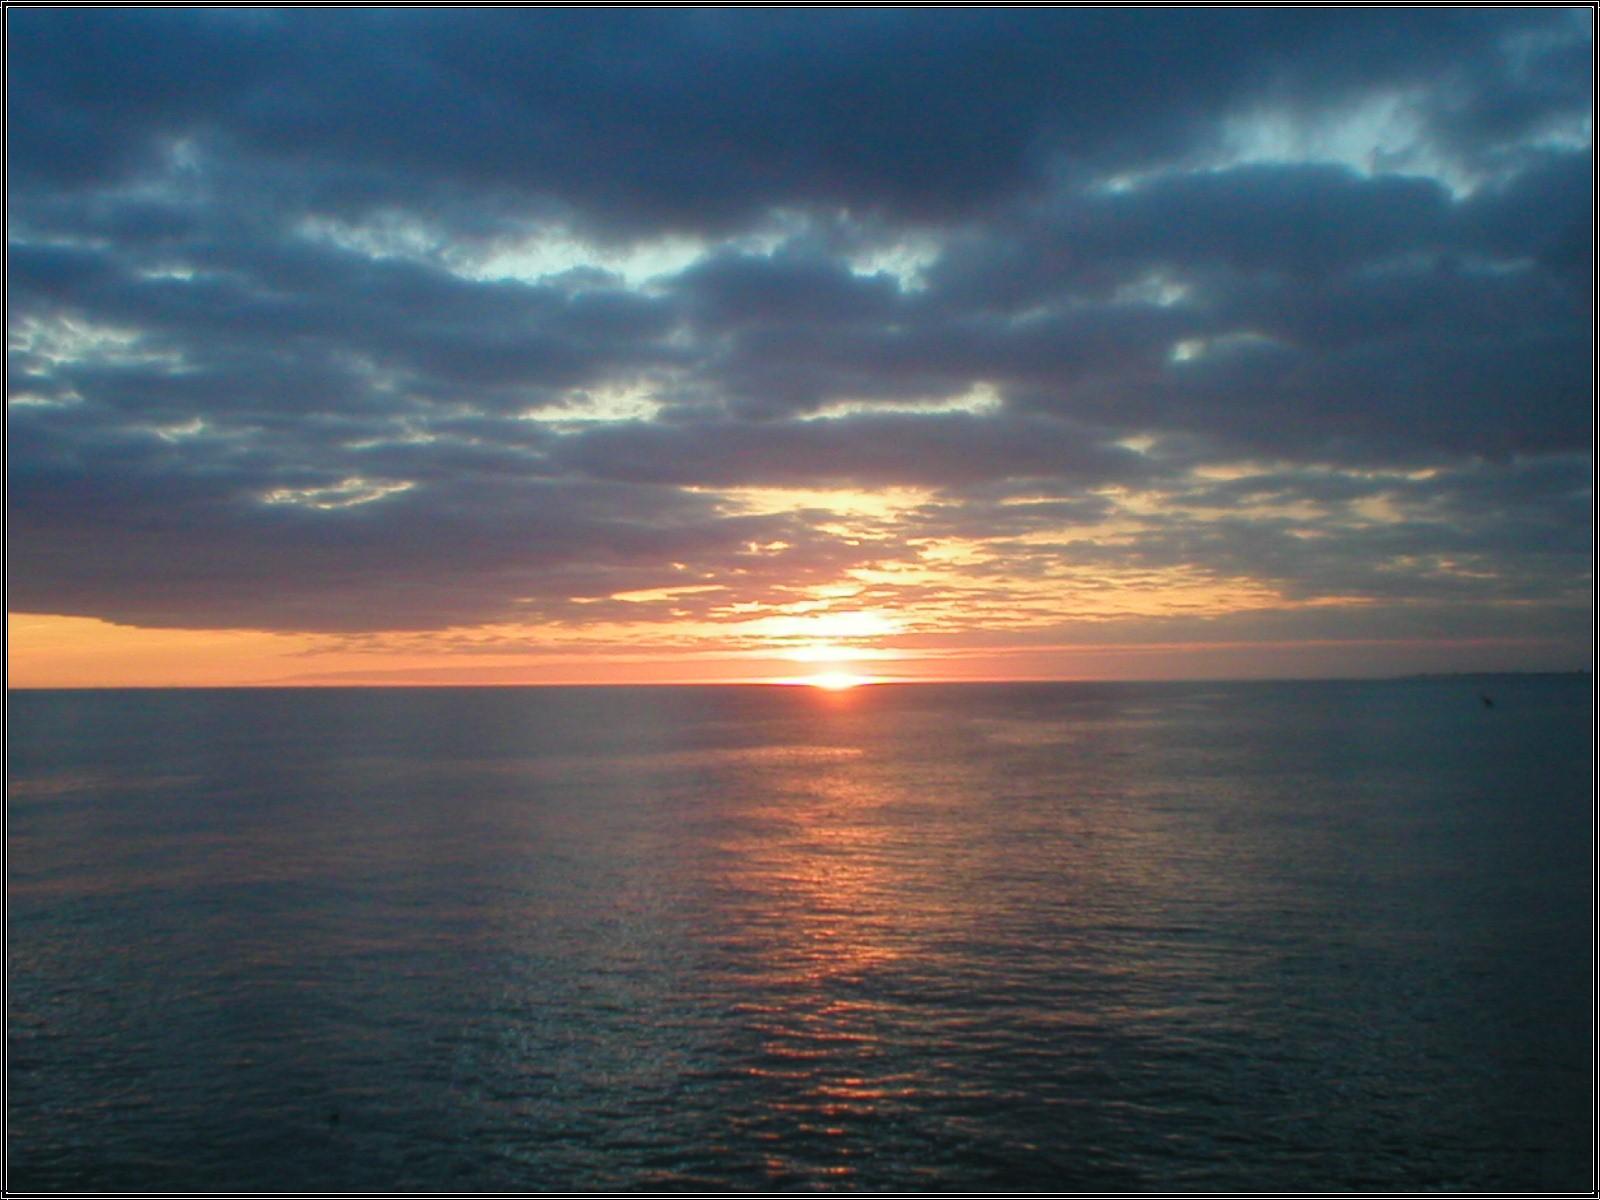 sunset-feb